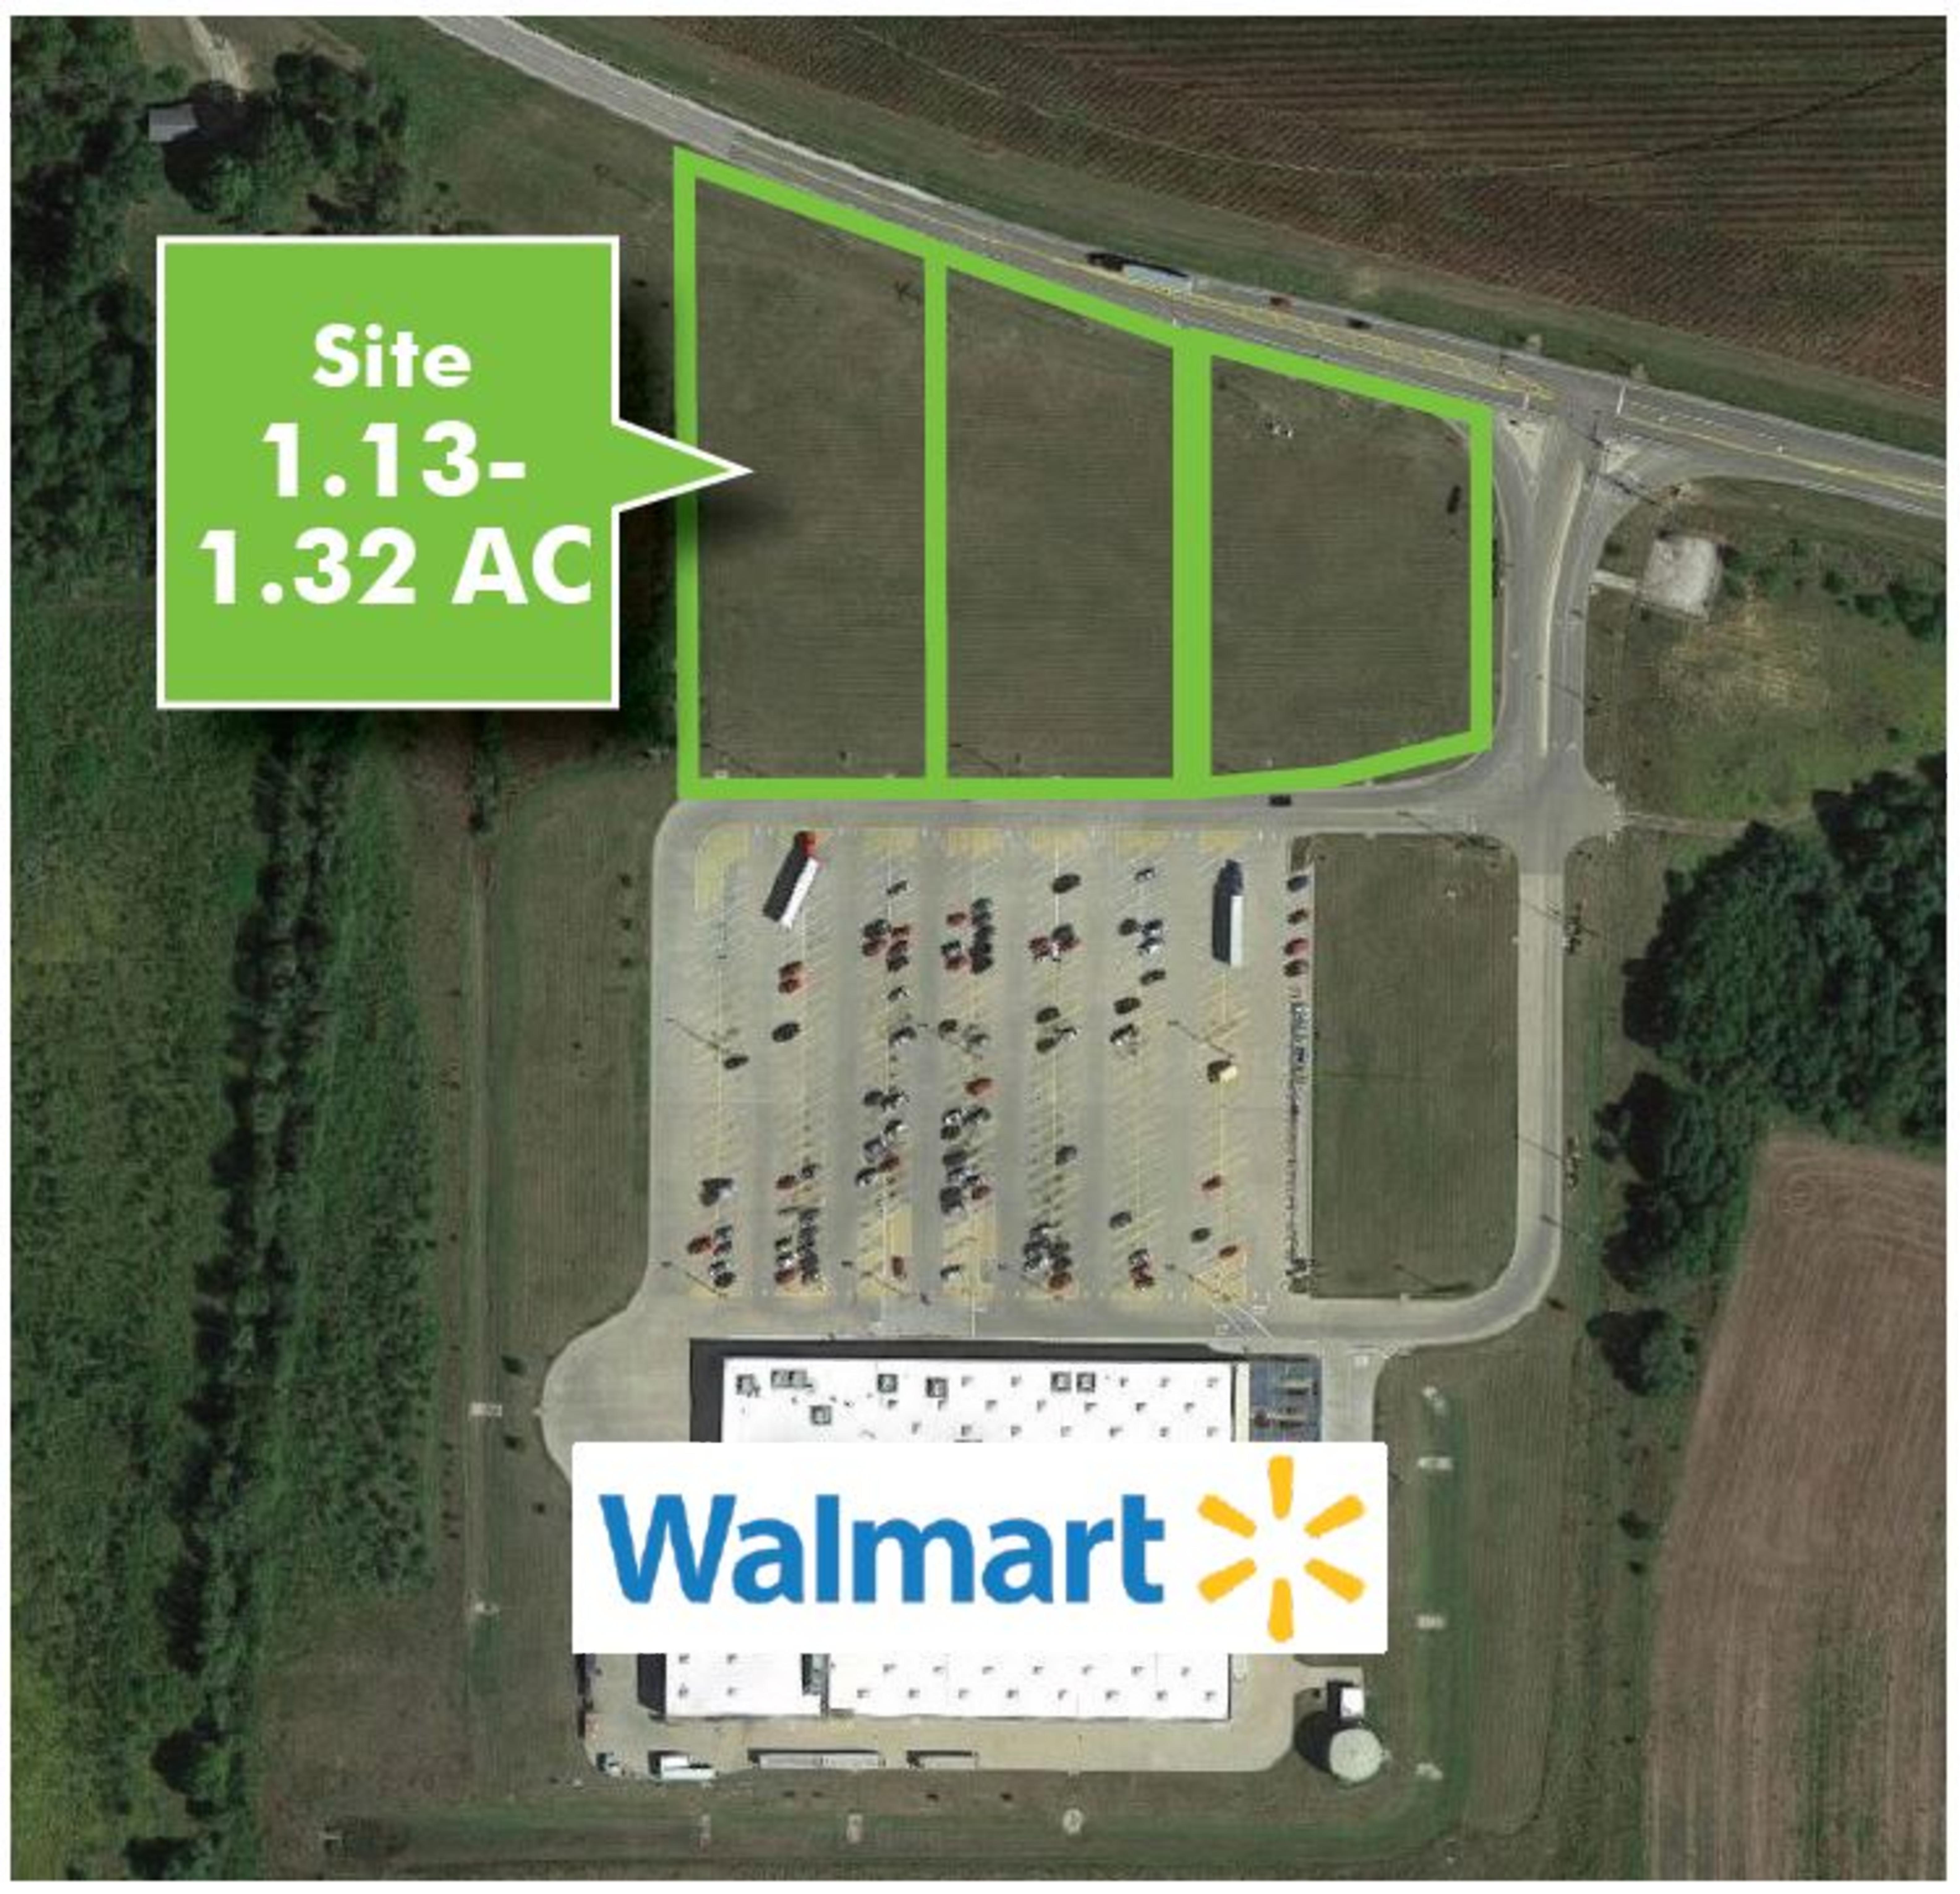 Walmart Outlot Beardstown: site plan